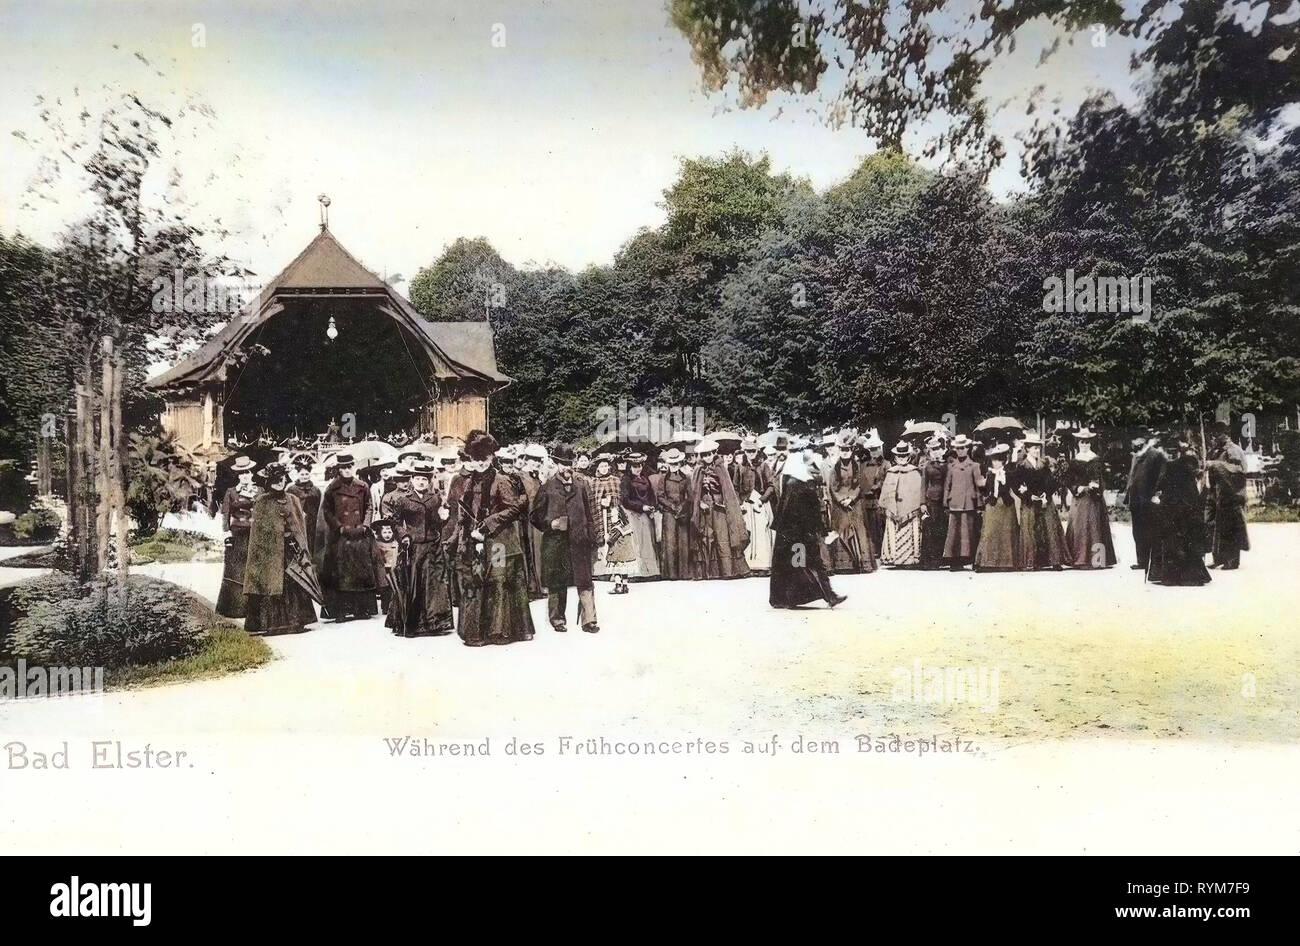 Concerts in Germany, 1903, Vogtlandkreis, Bad Elster, Frühkonzert auf dem Badeplatz - Stock Image